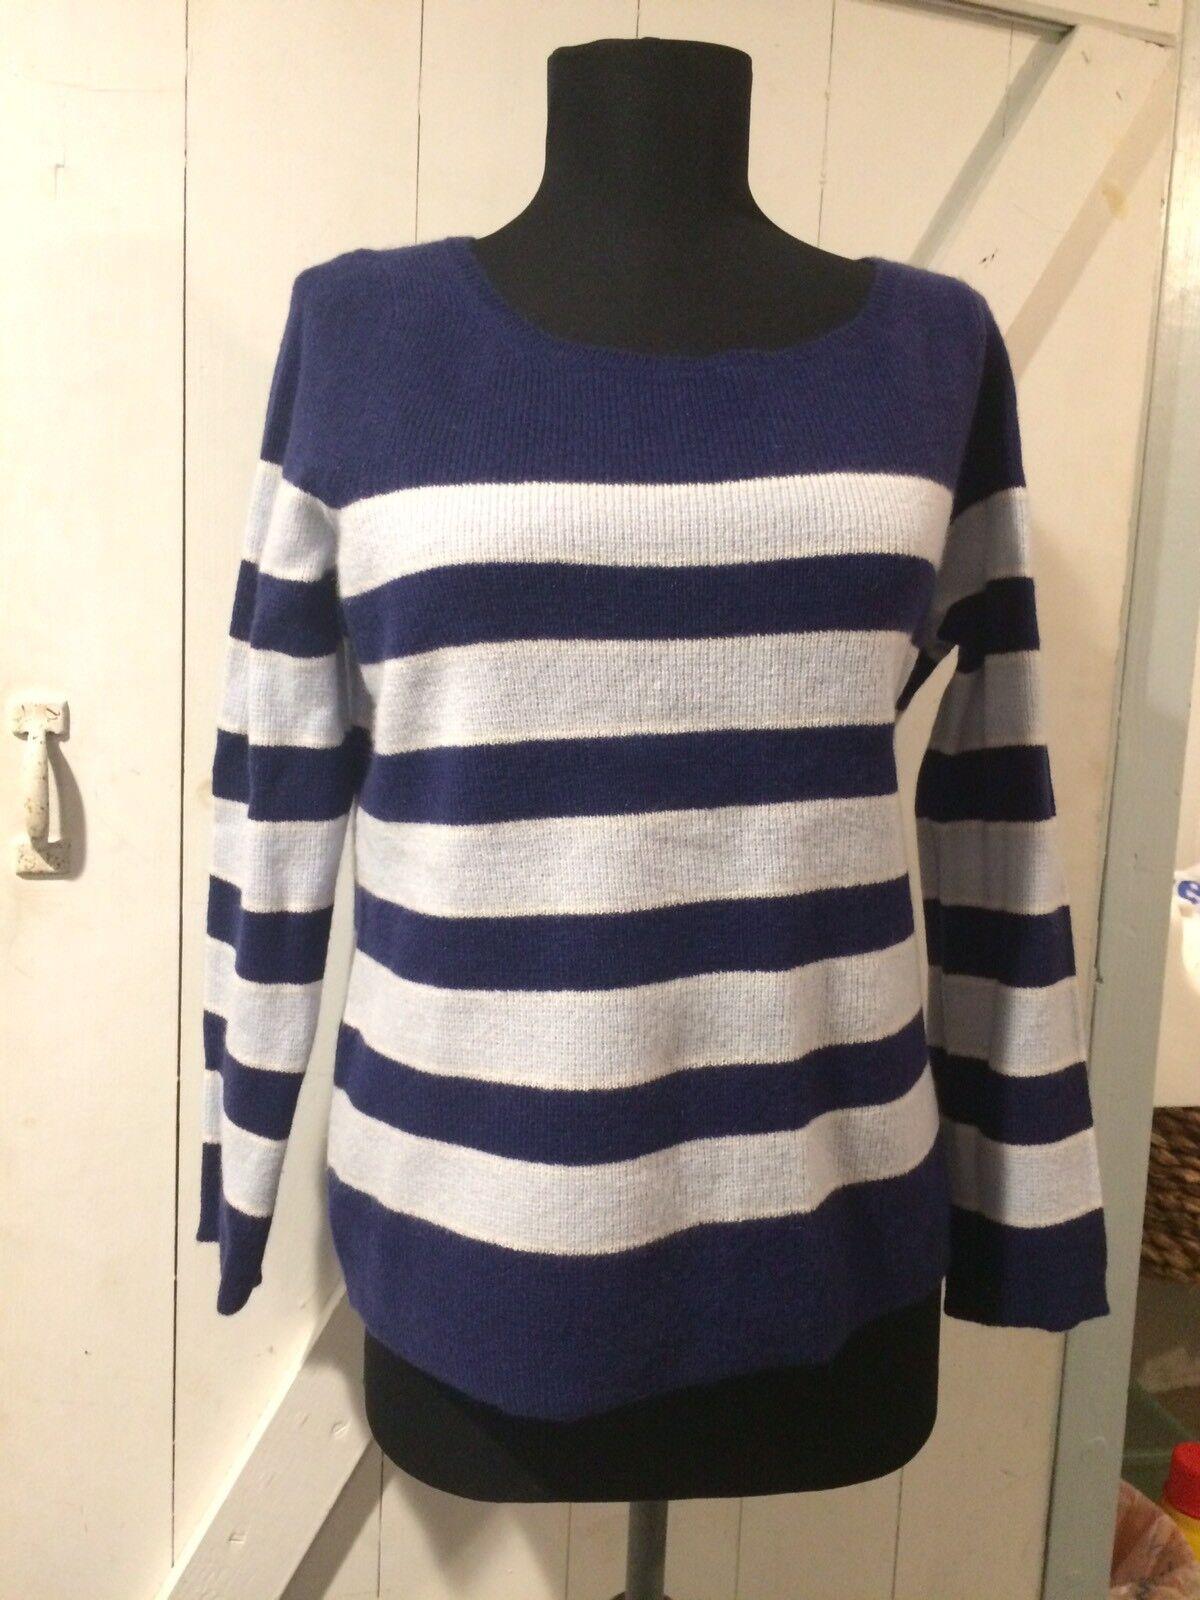 NWT Calypso Cashmire Striped Striped Striped Shorty Sweater M  285 623721